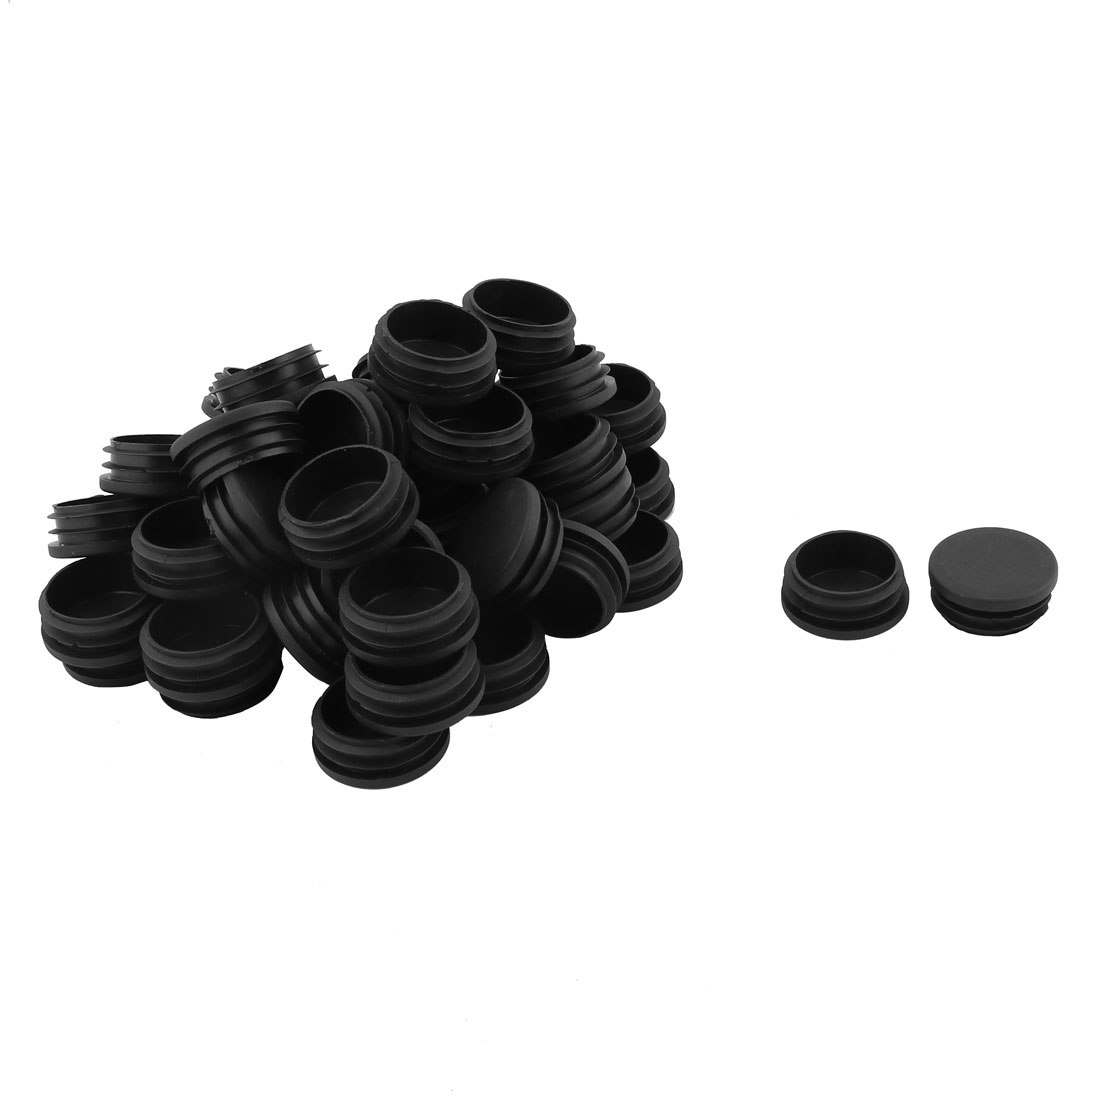 Plastic Round Shaped Table Chair Leg Foot Tube Insert Black 4cm Diameter 50 Pcs